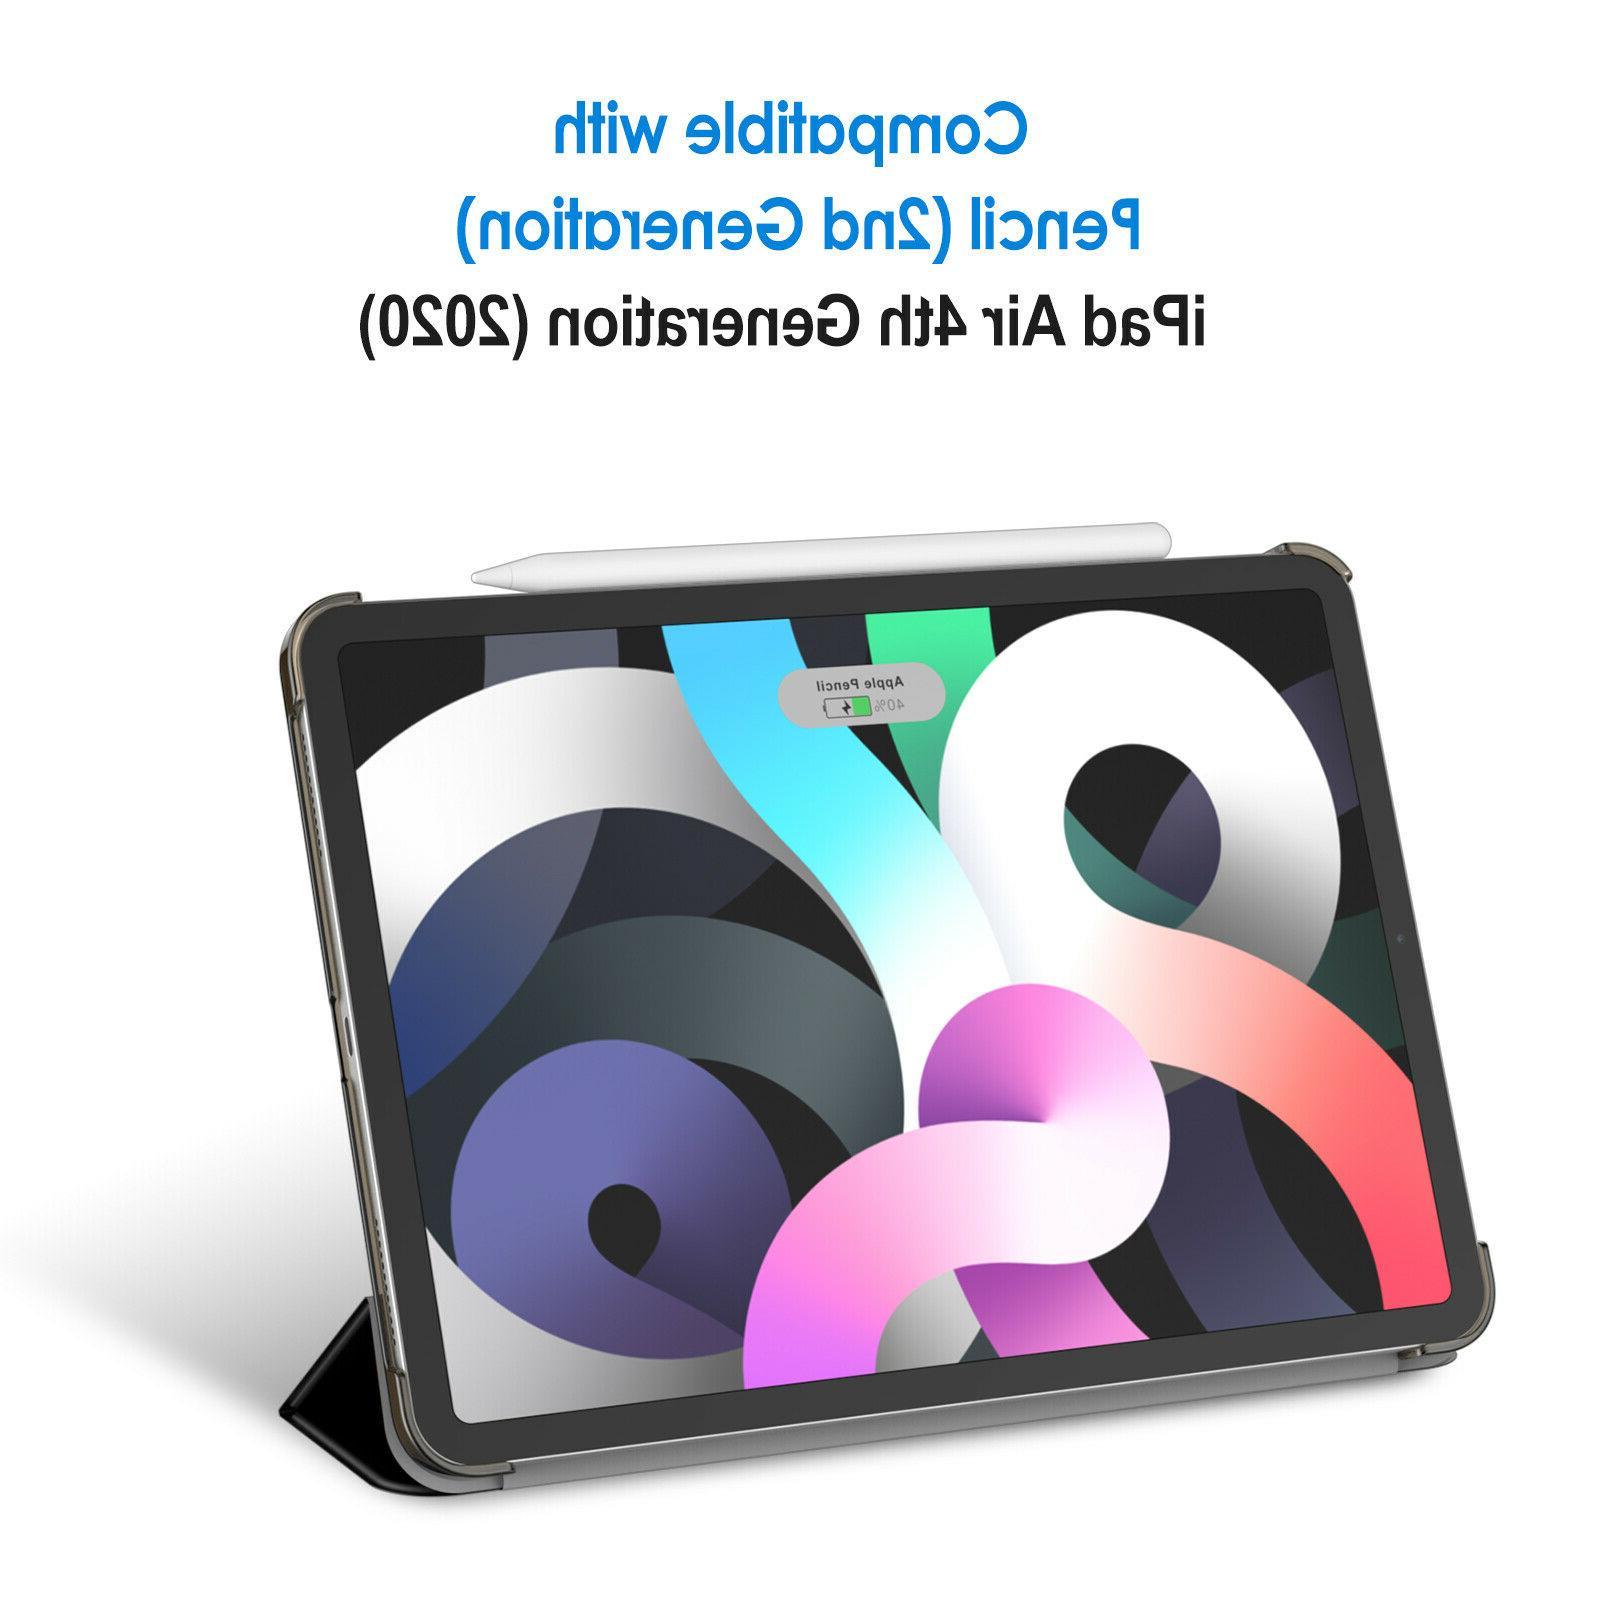 JETech Case iPad Air 4th Generation 10.9-Inch Black